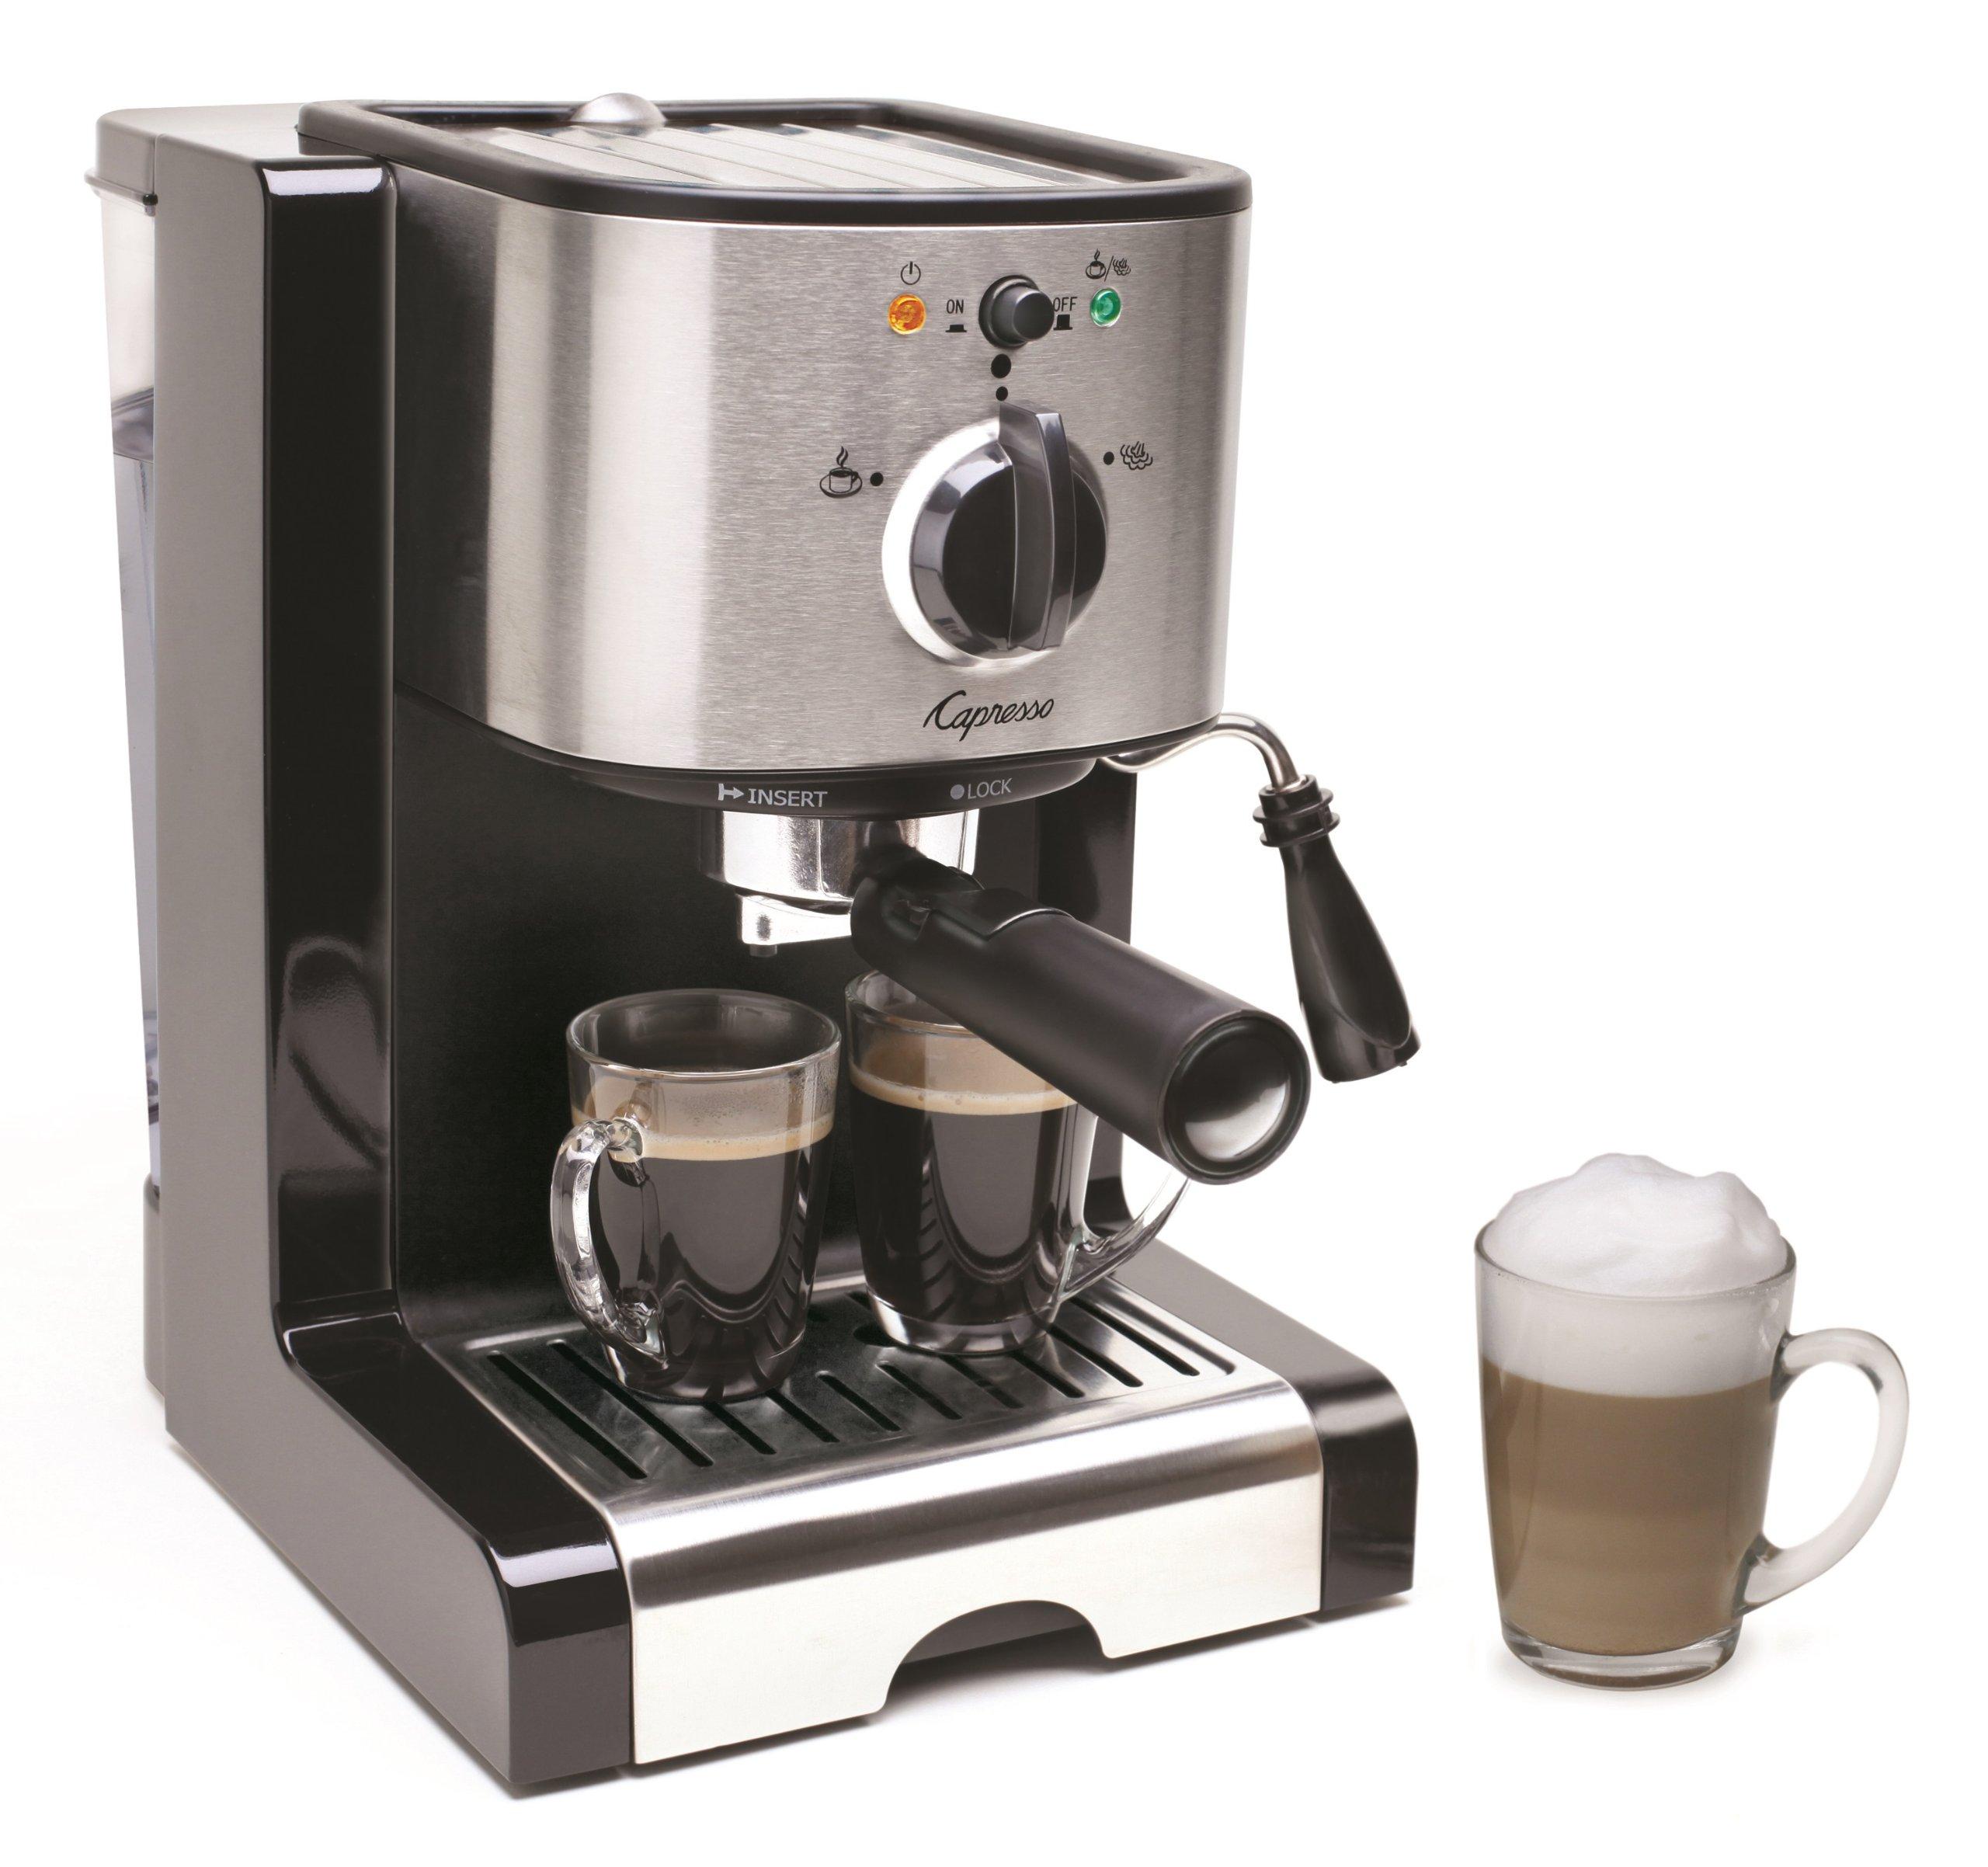 Capresso 116.04 Pump Espresso and Cappuccino Machine EC100, Black and Stainless by Capresso (Image #4)